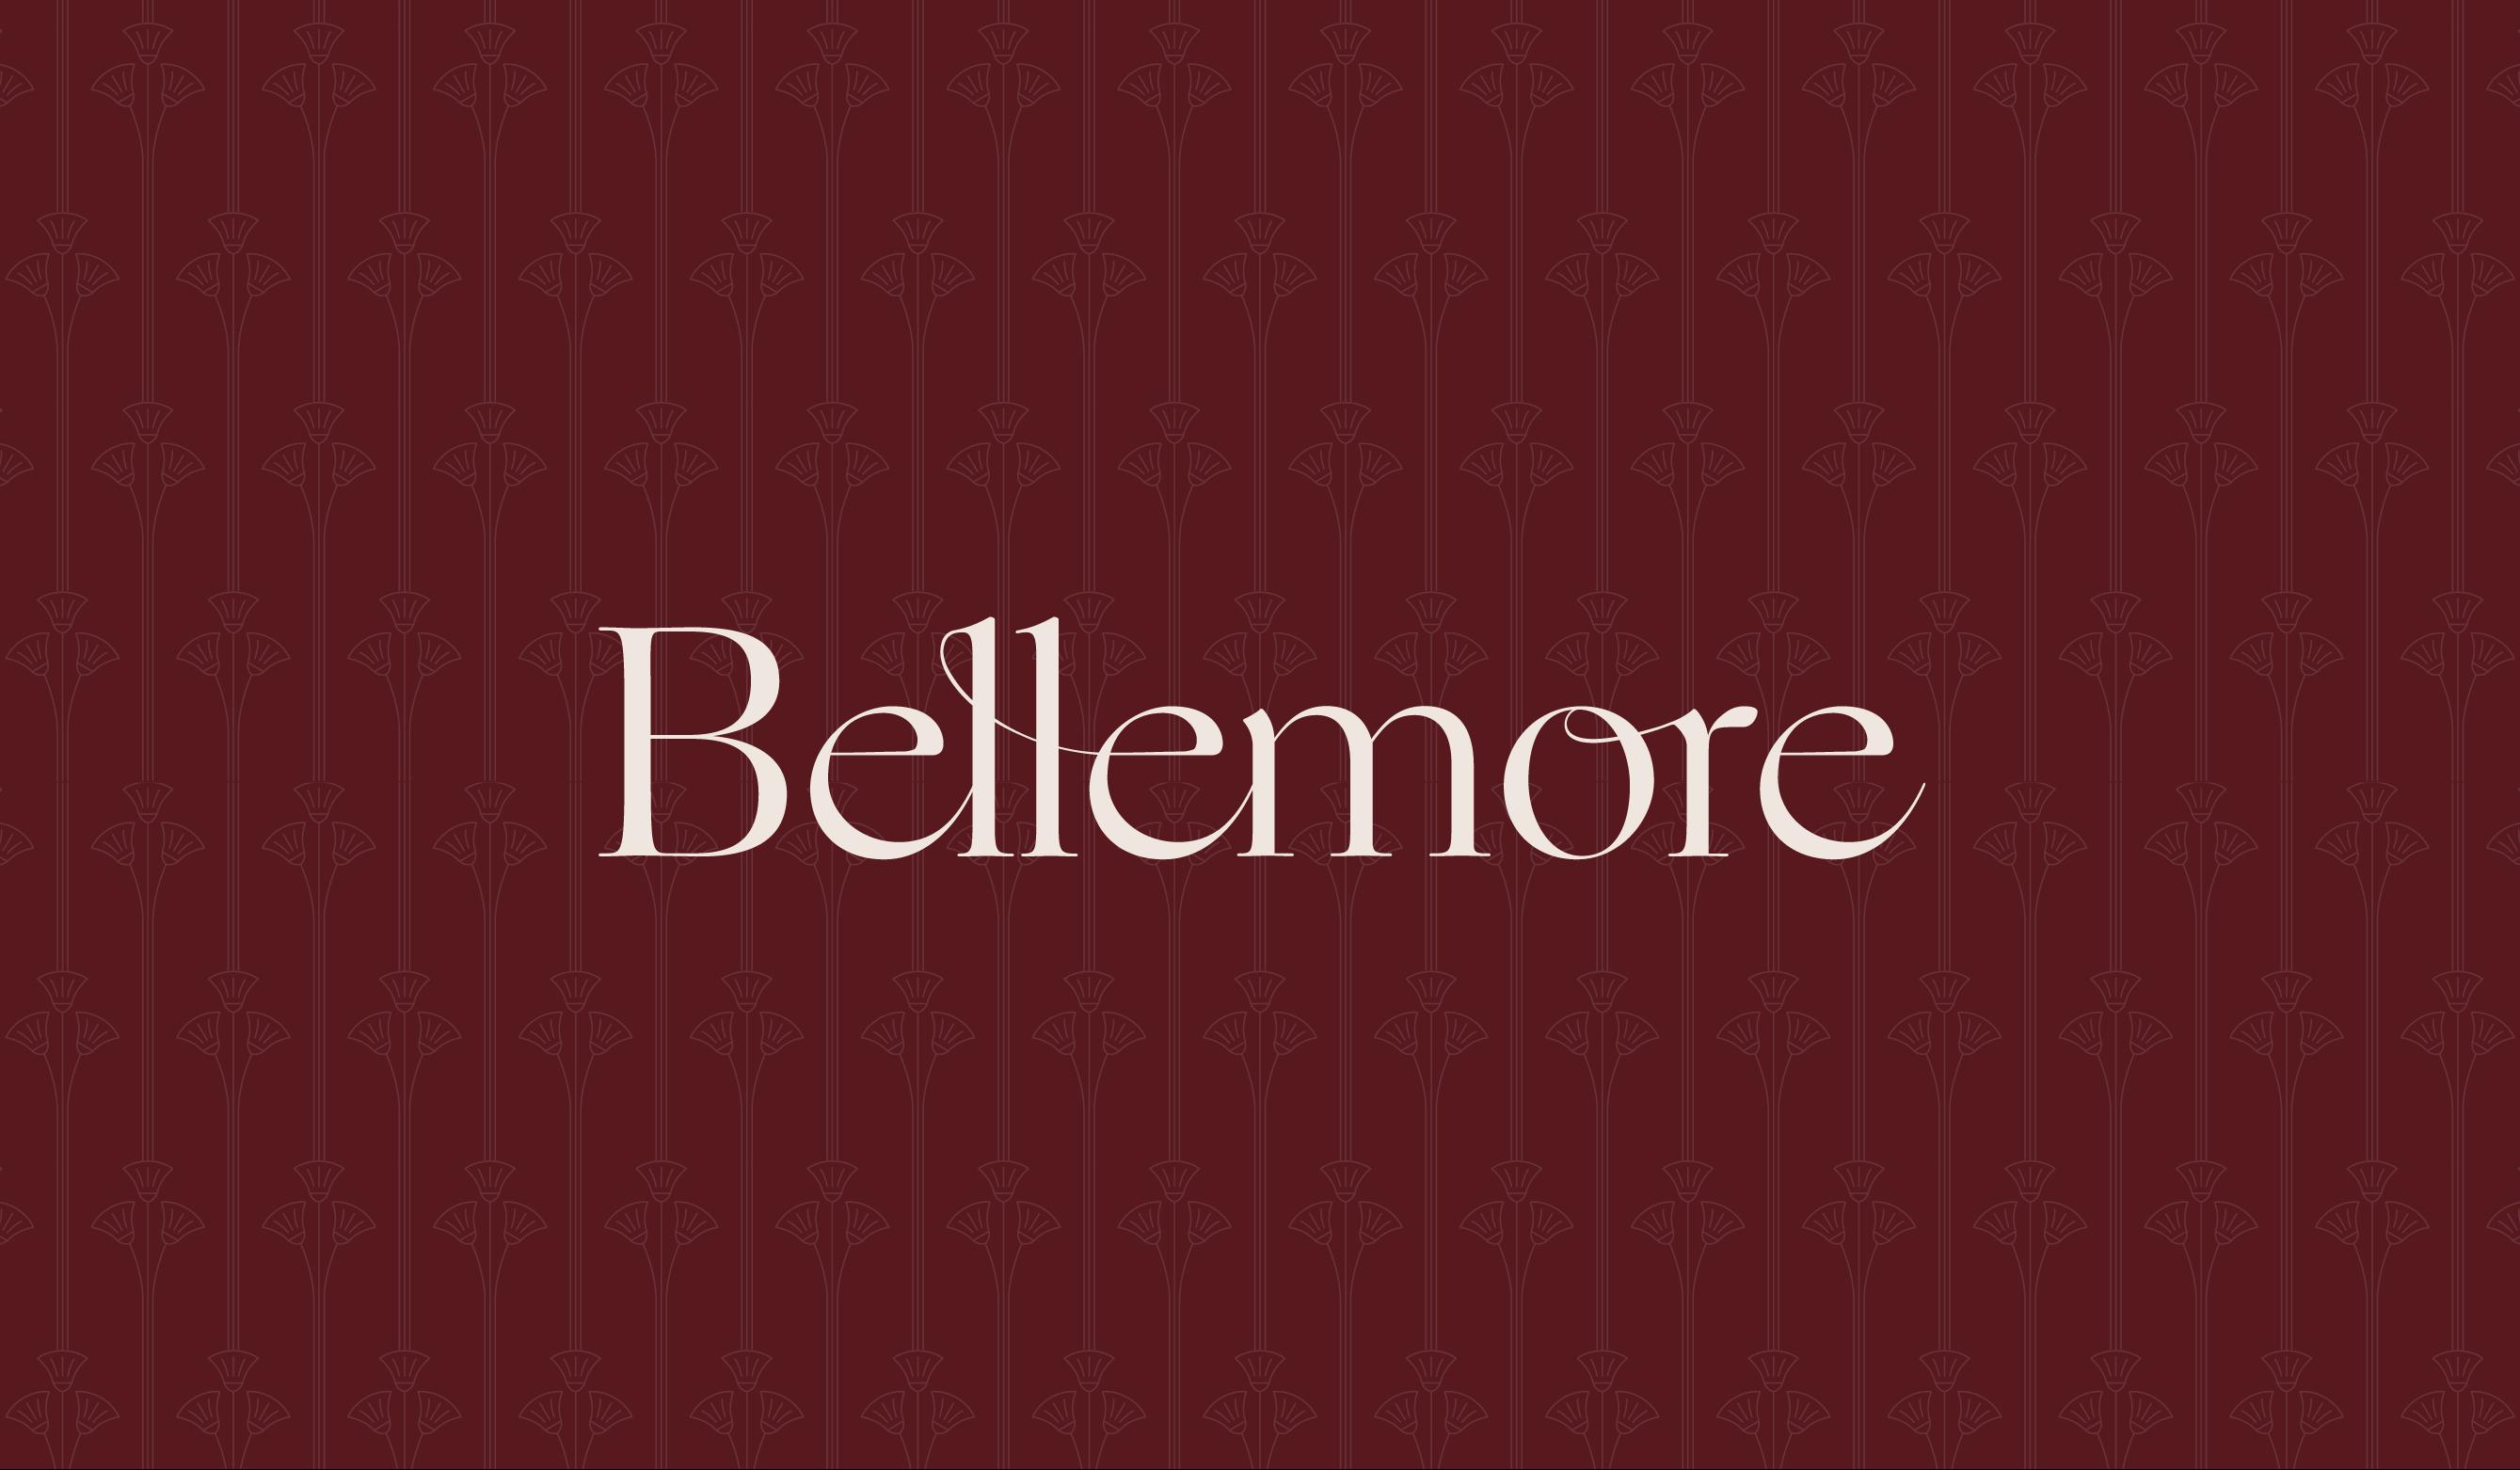 Bellemore_HeaderImage